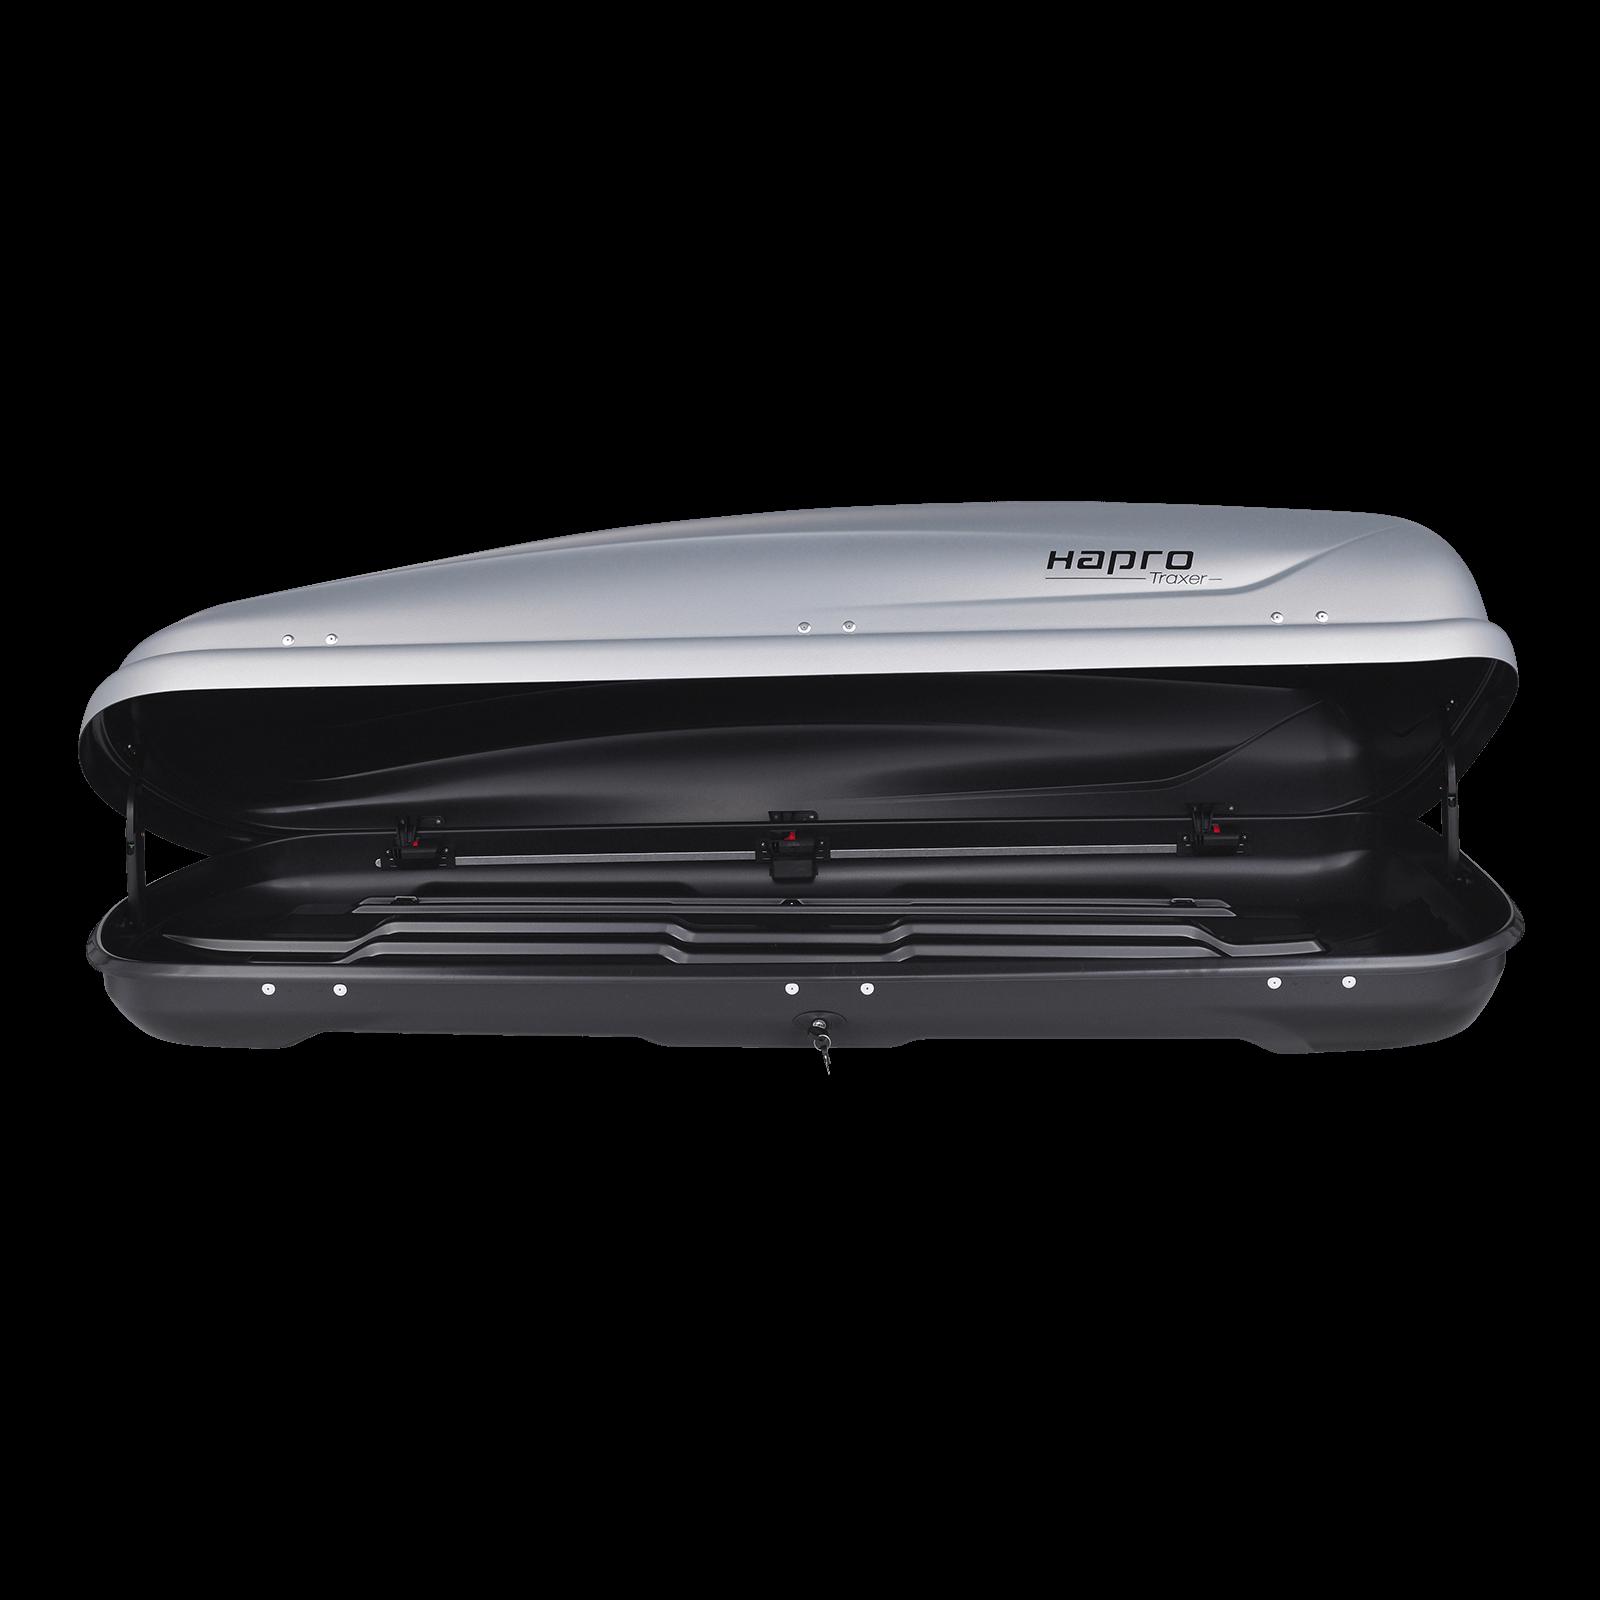 Dachbox Hapro Traxer 6.6 SilverGrey - Bild 2